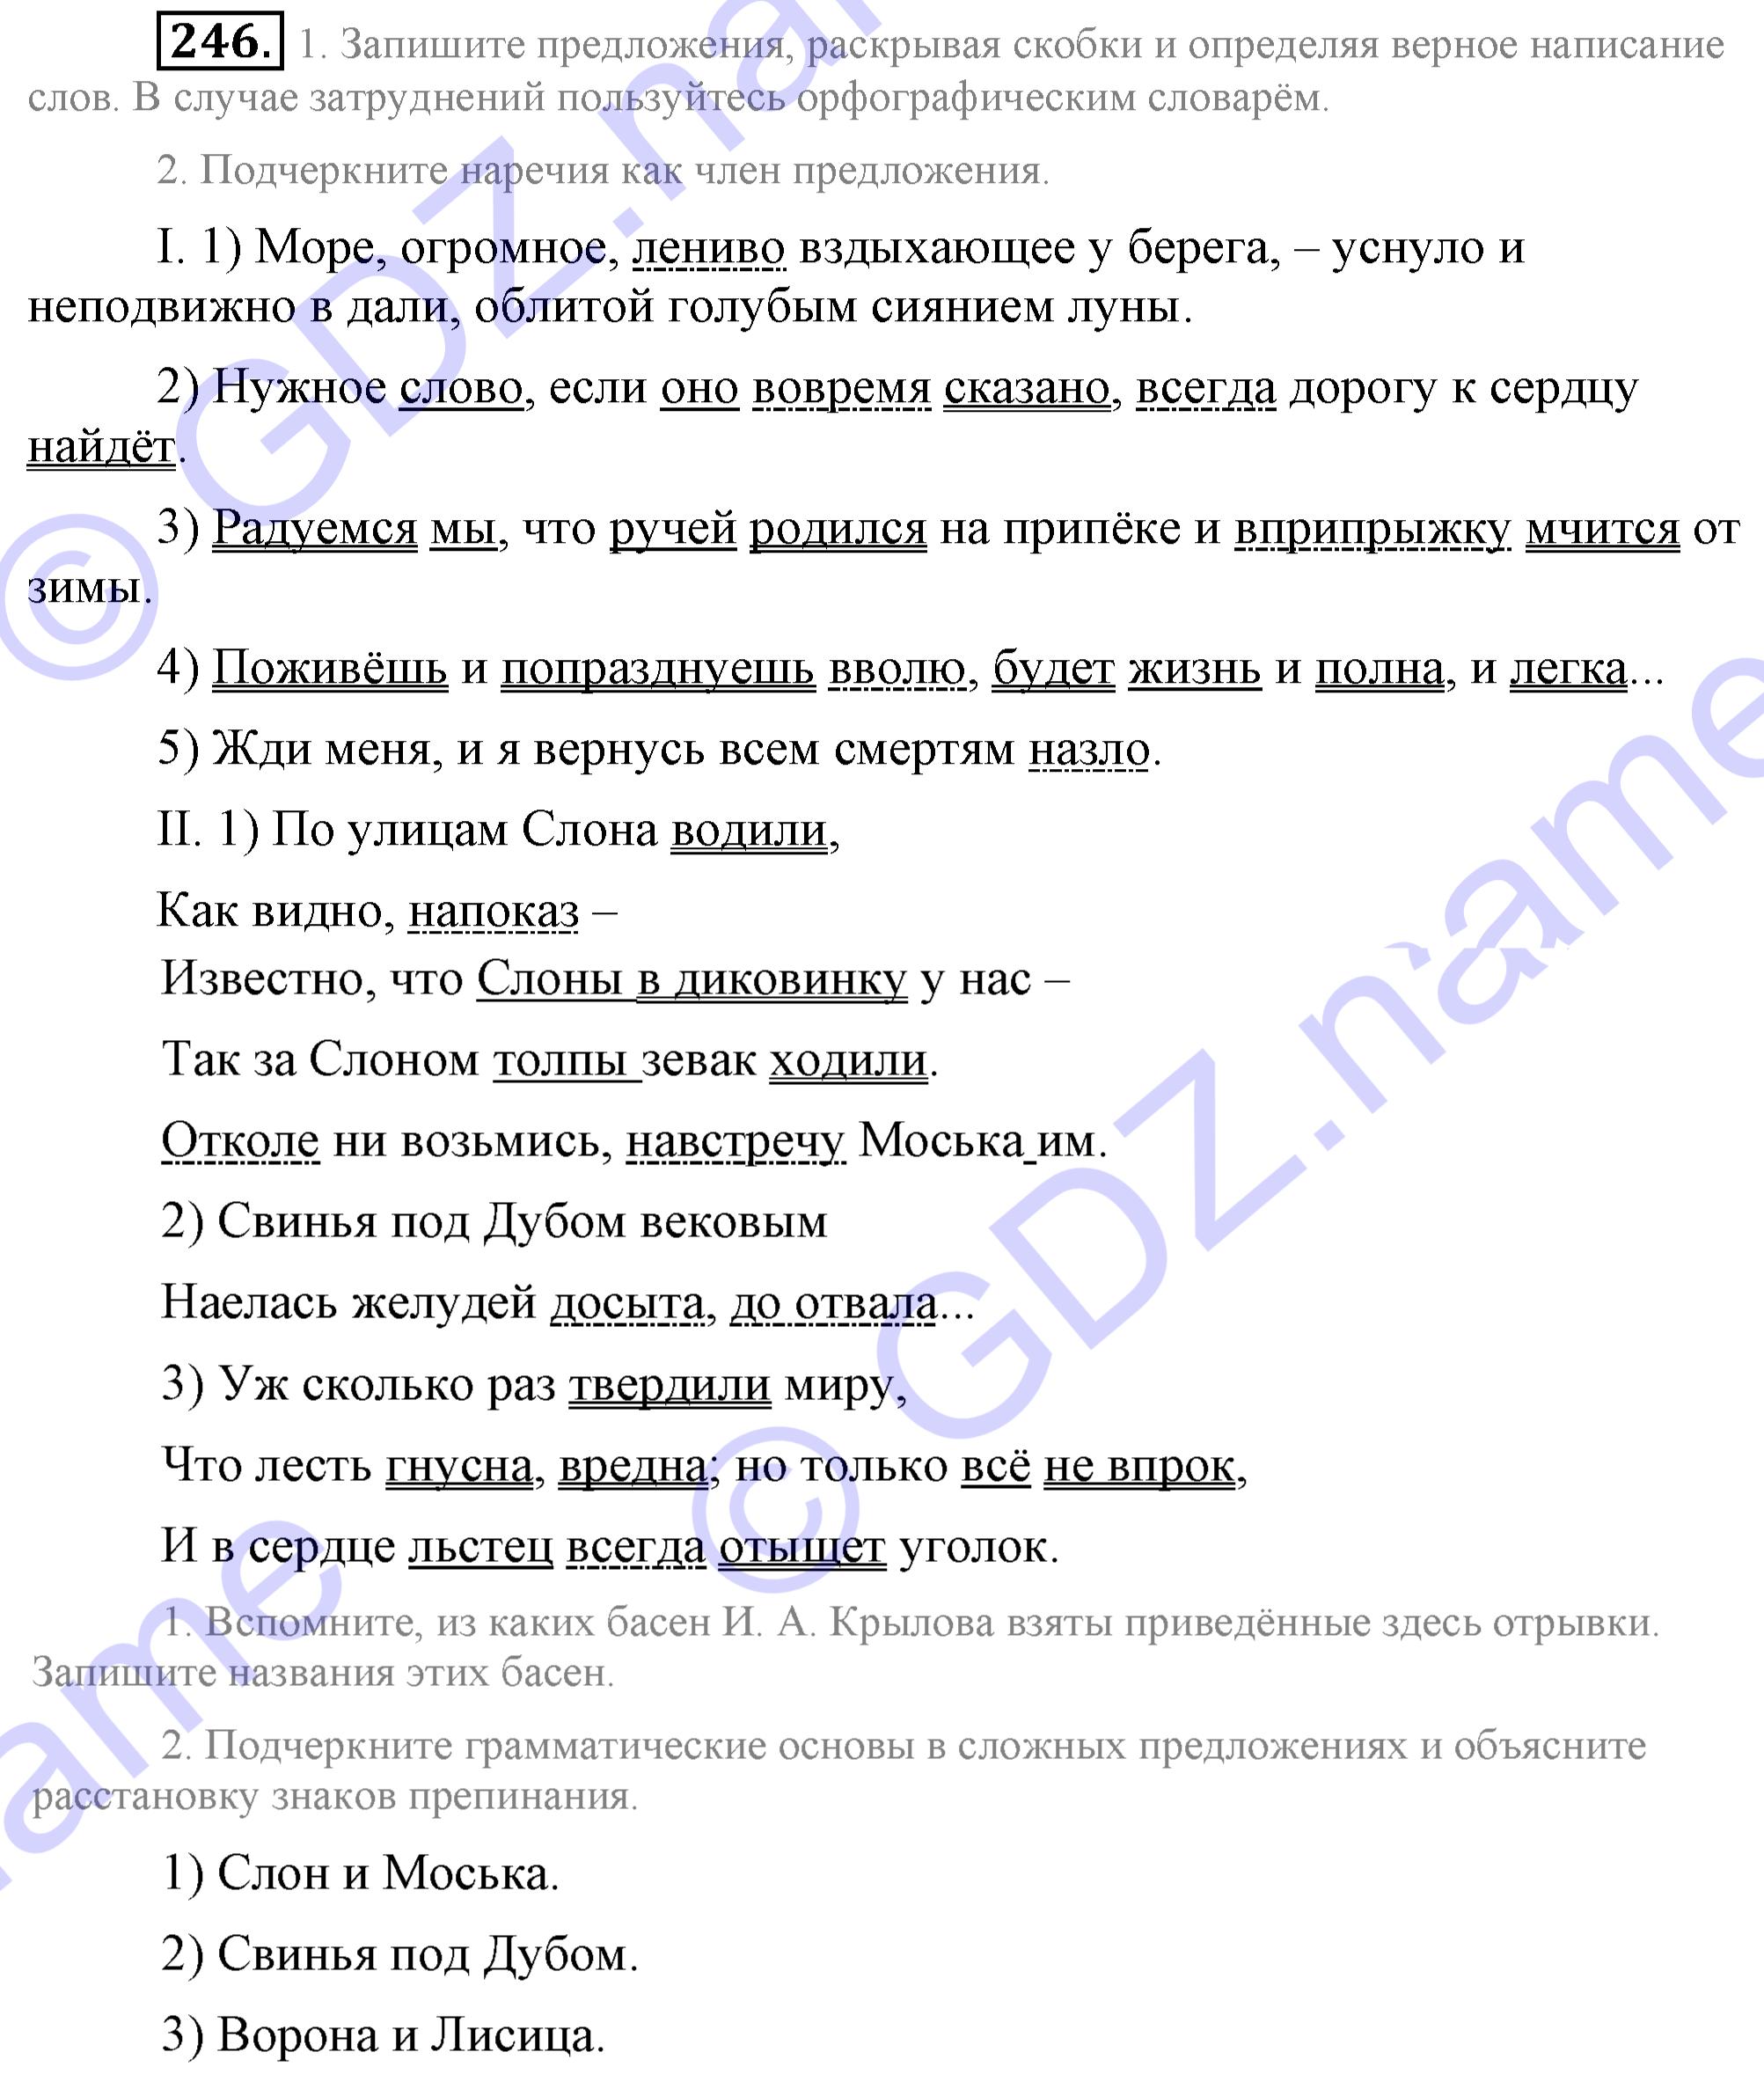 Решение задачи 407 богдановича 2 класс